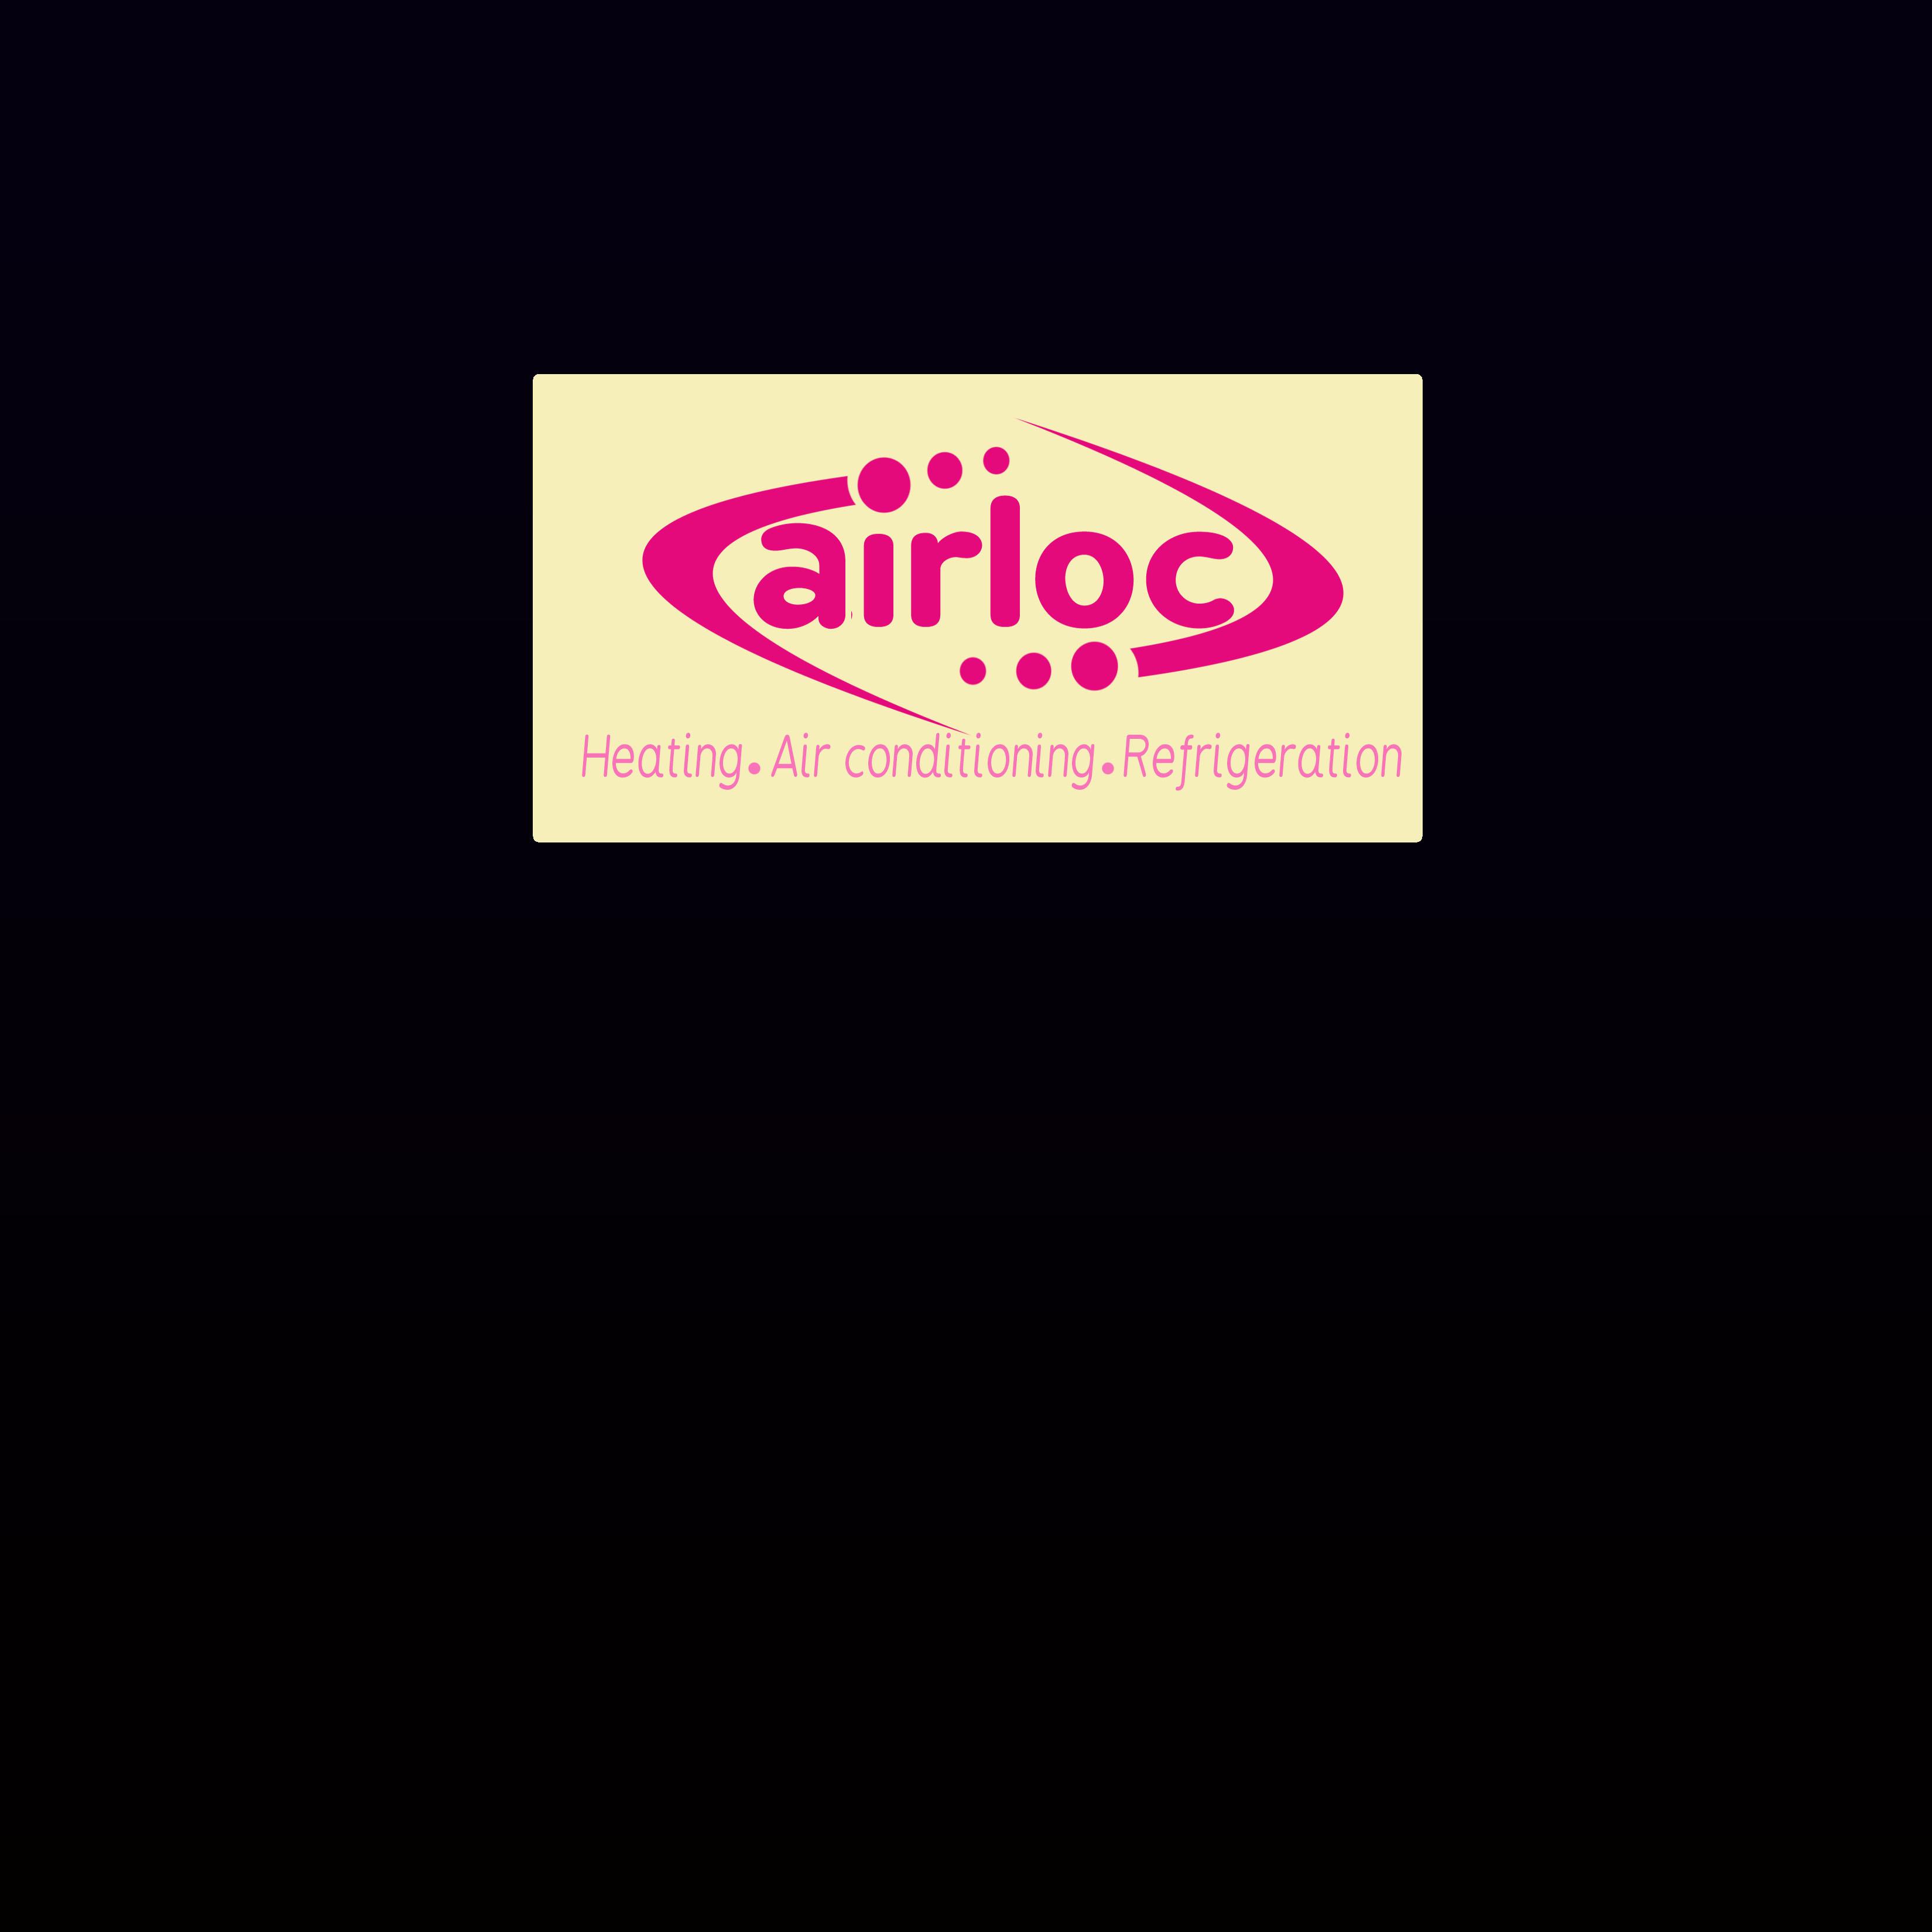 Logo Design by Allan Esclamado - Entry No. 198 in the Logo Design Contest Airloc Logo Design.